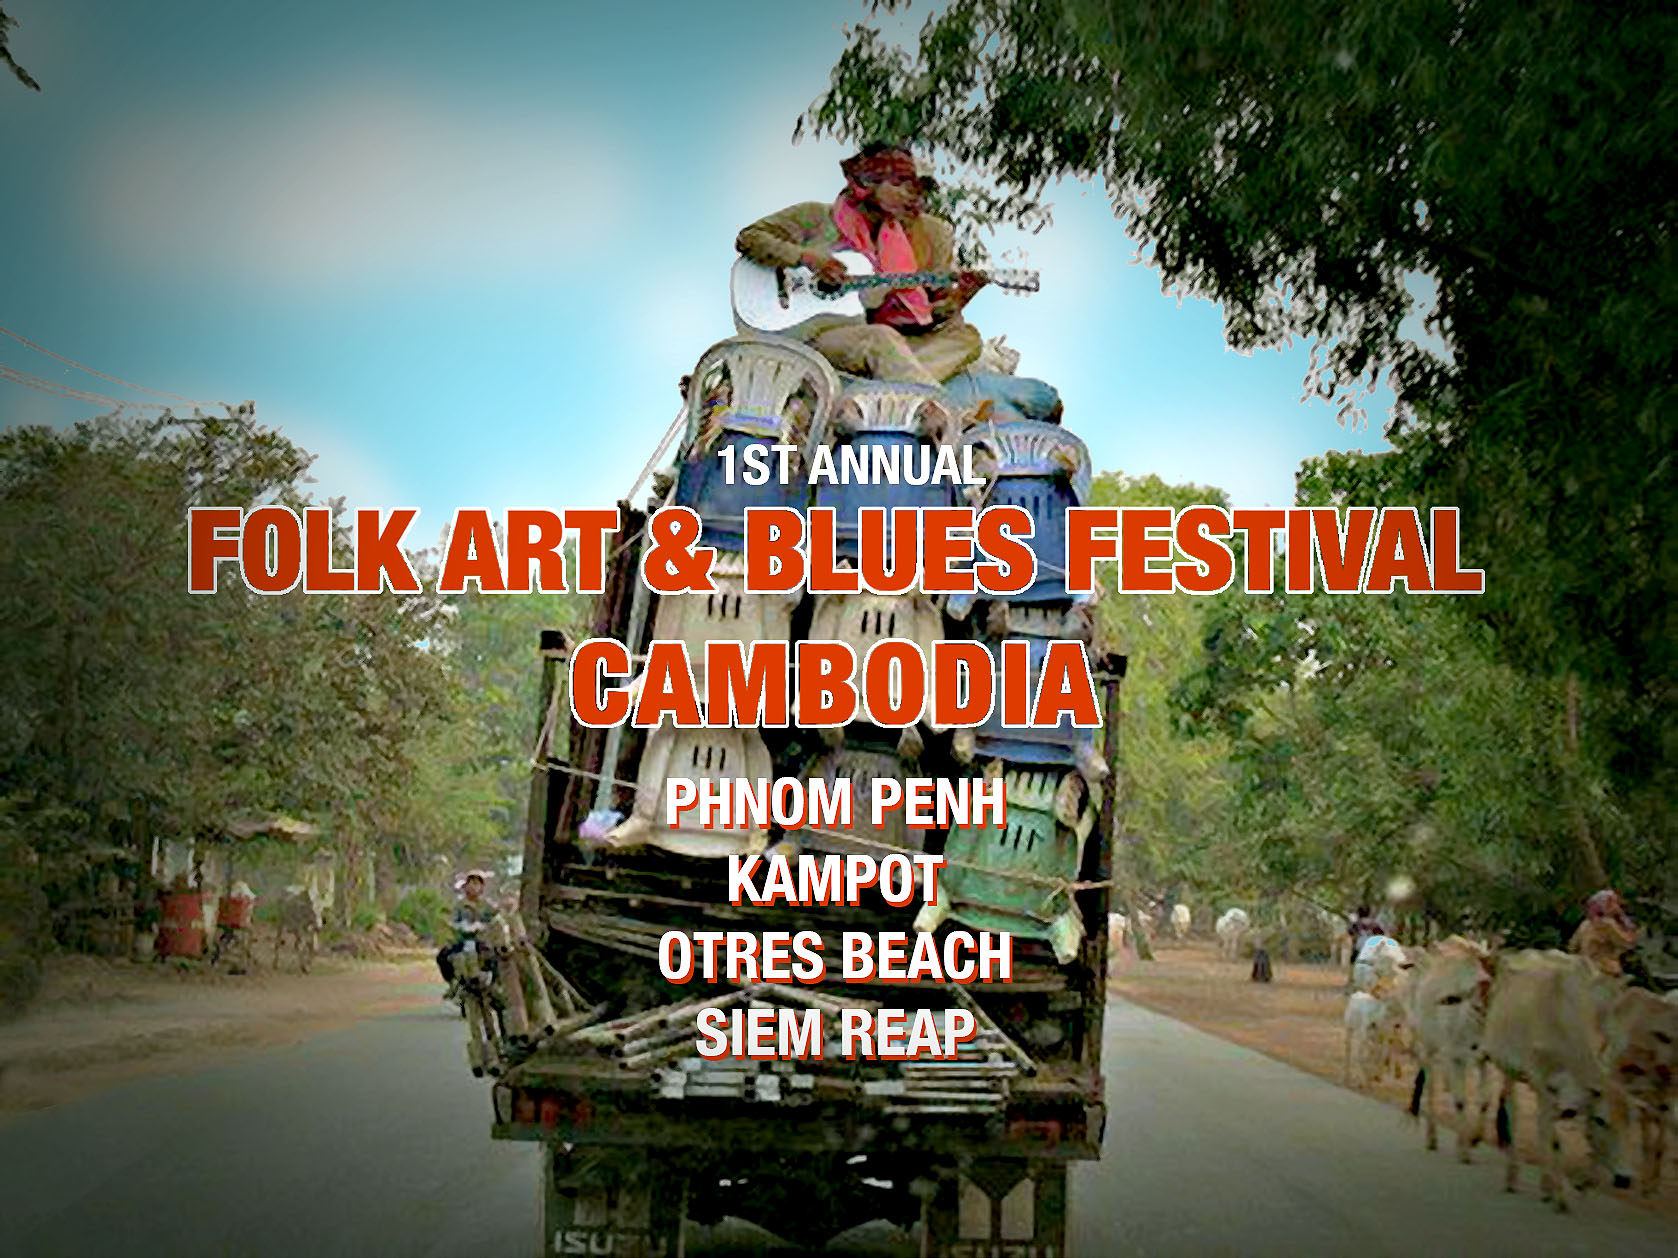 IntroducingFOLK ART & BLUES FESTIVAL